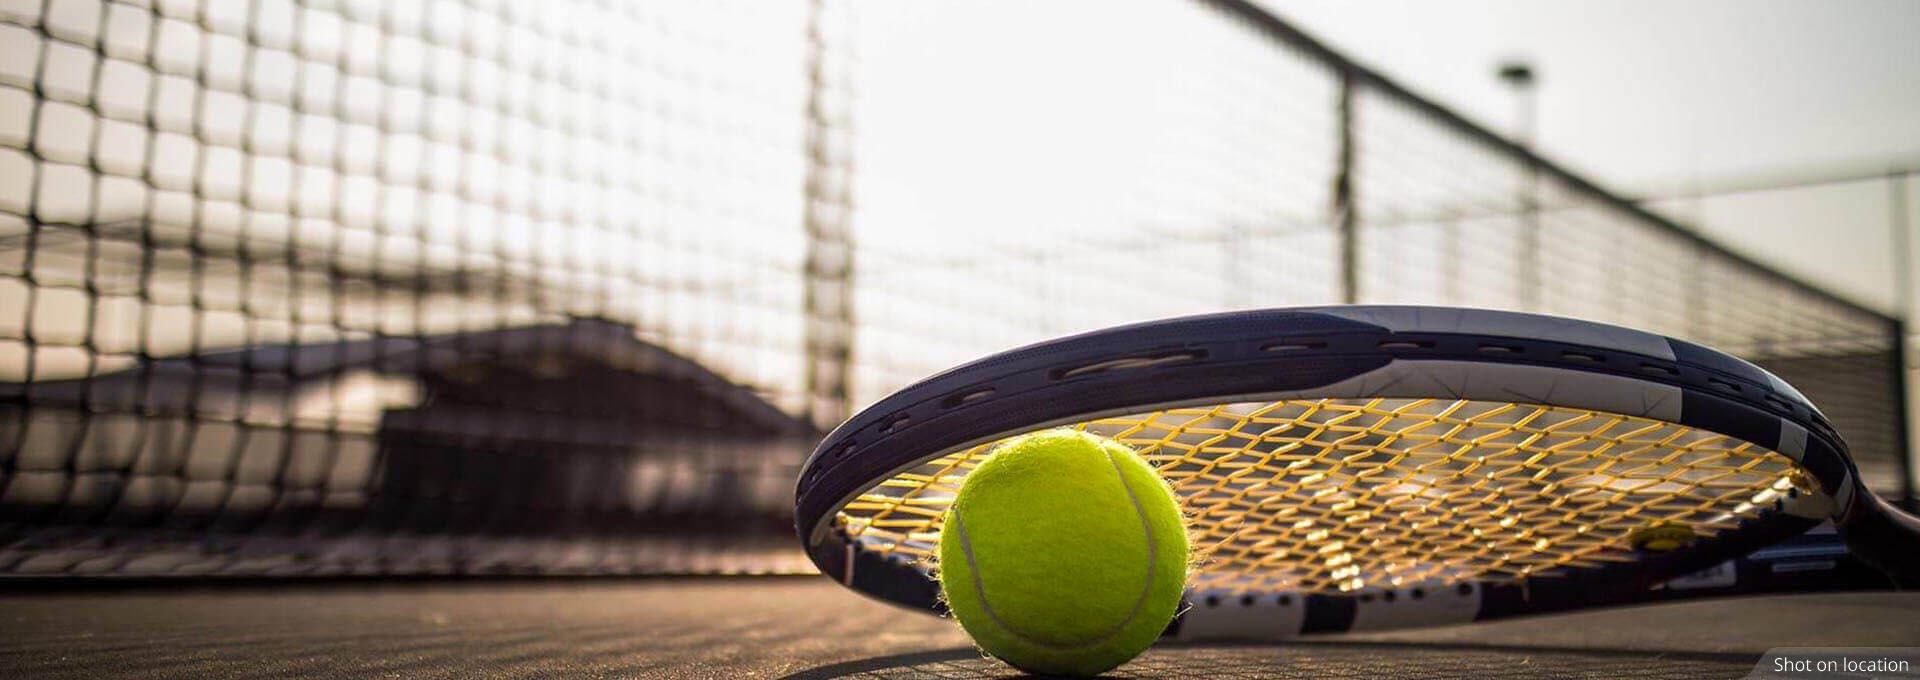 Lawn Tennis court in Crossgate by House of Hiranandani in Devanahalli, Bengaluru